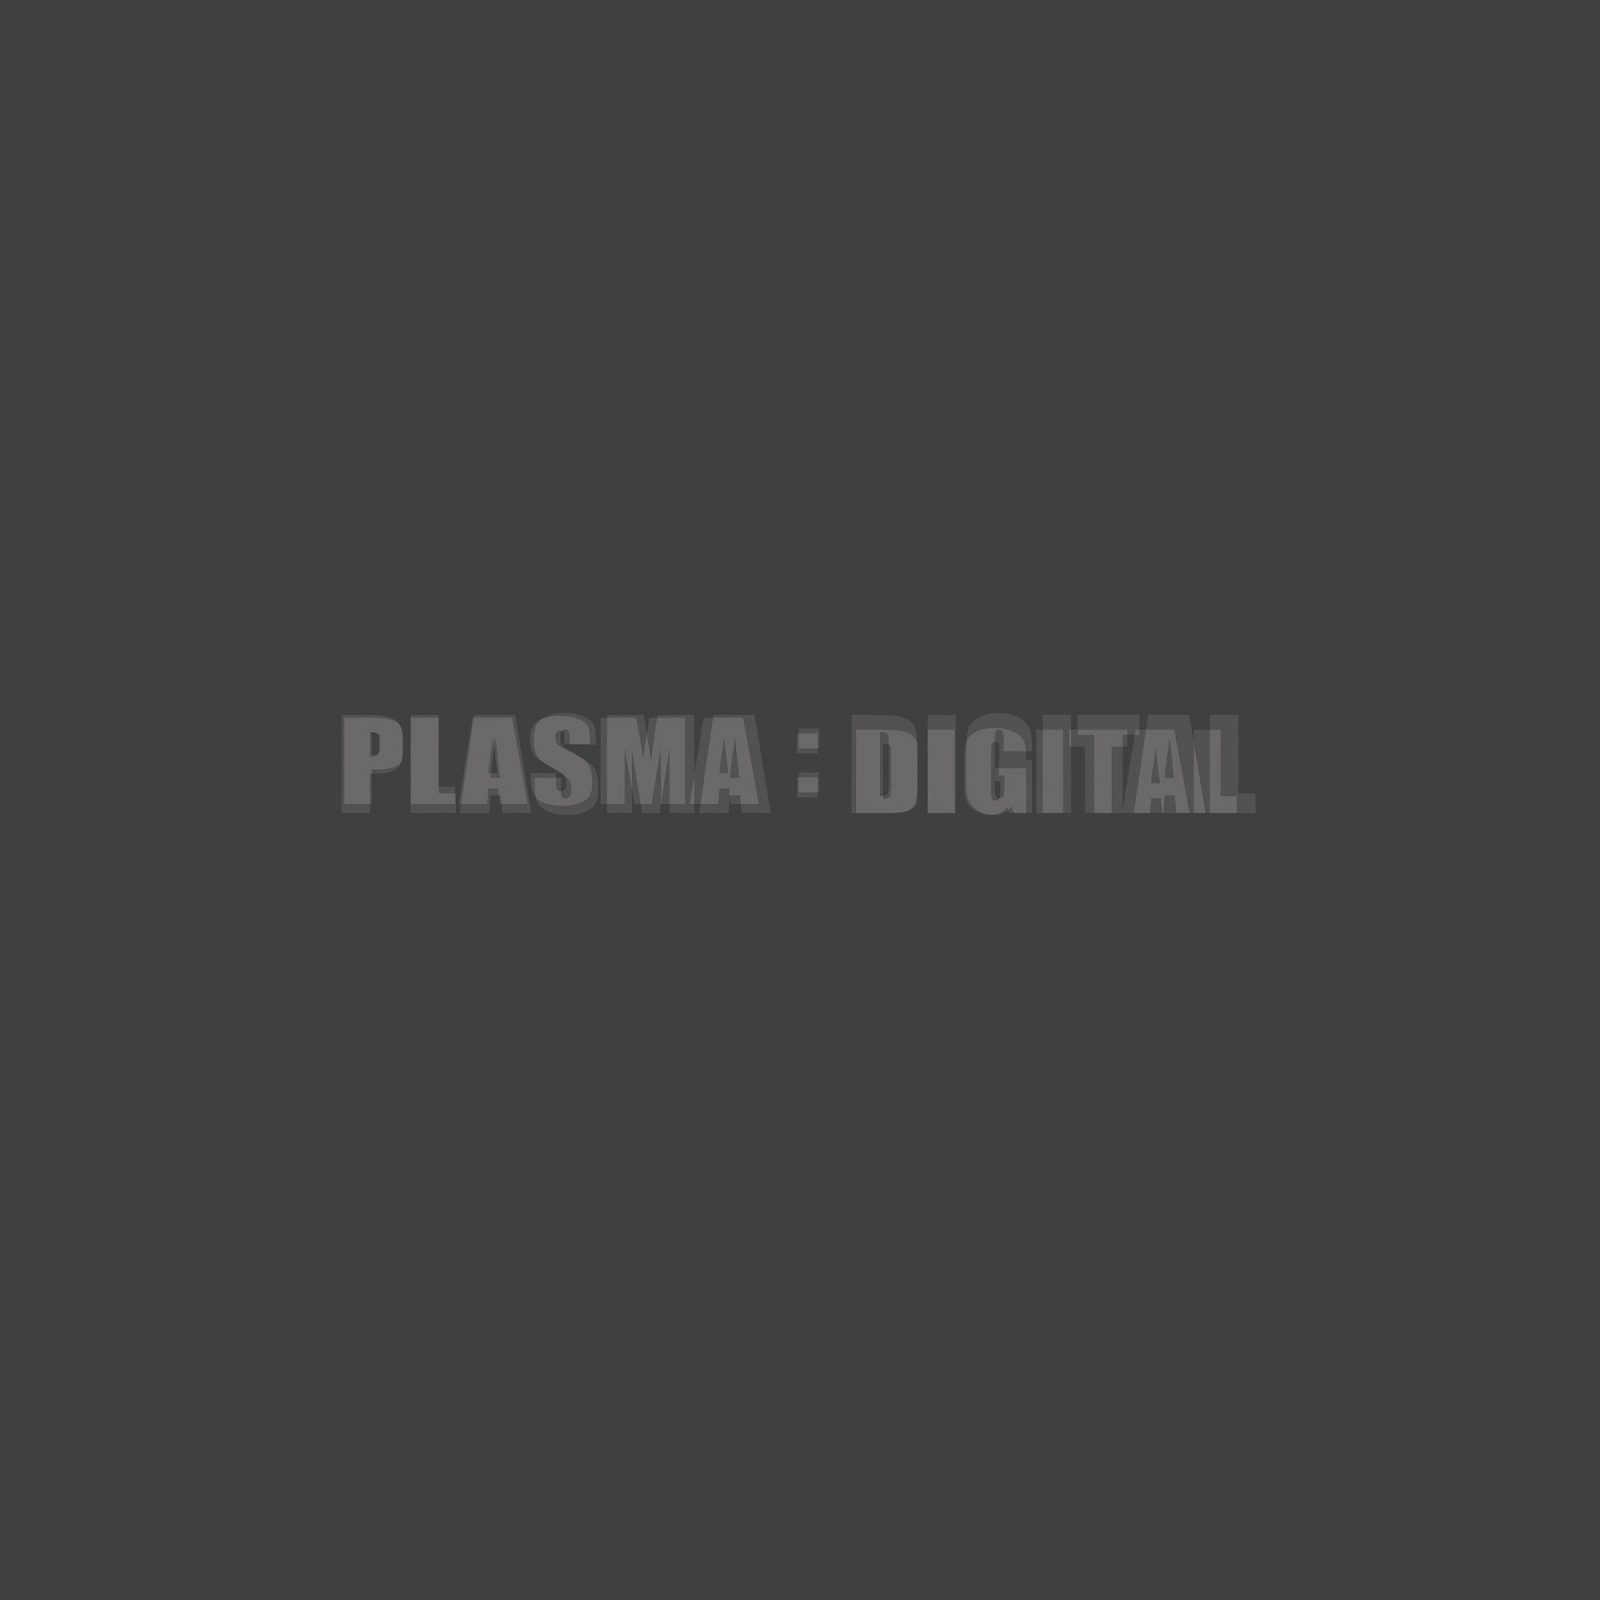 Ian Linter - Plasma Digital